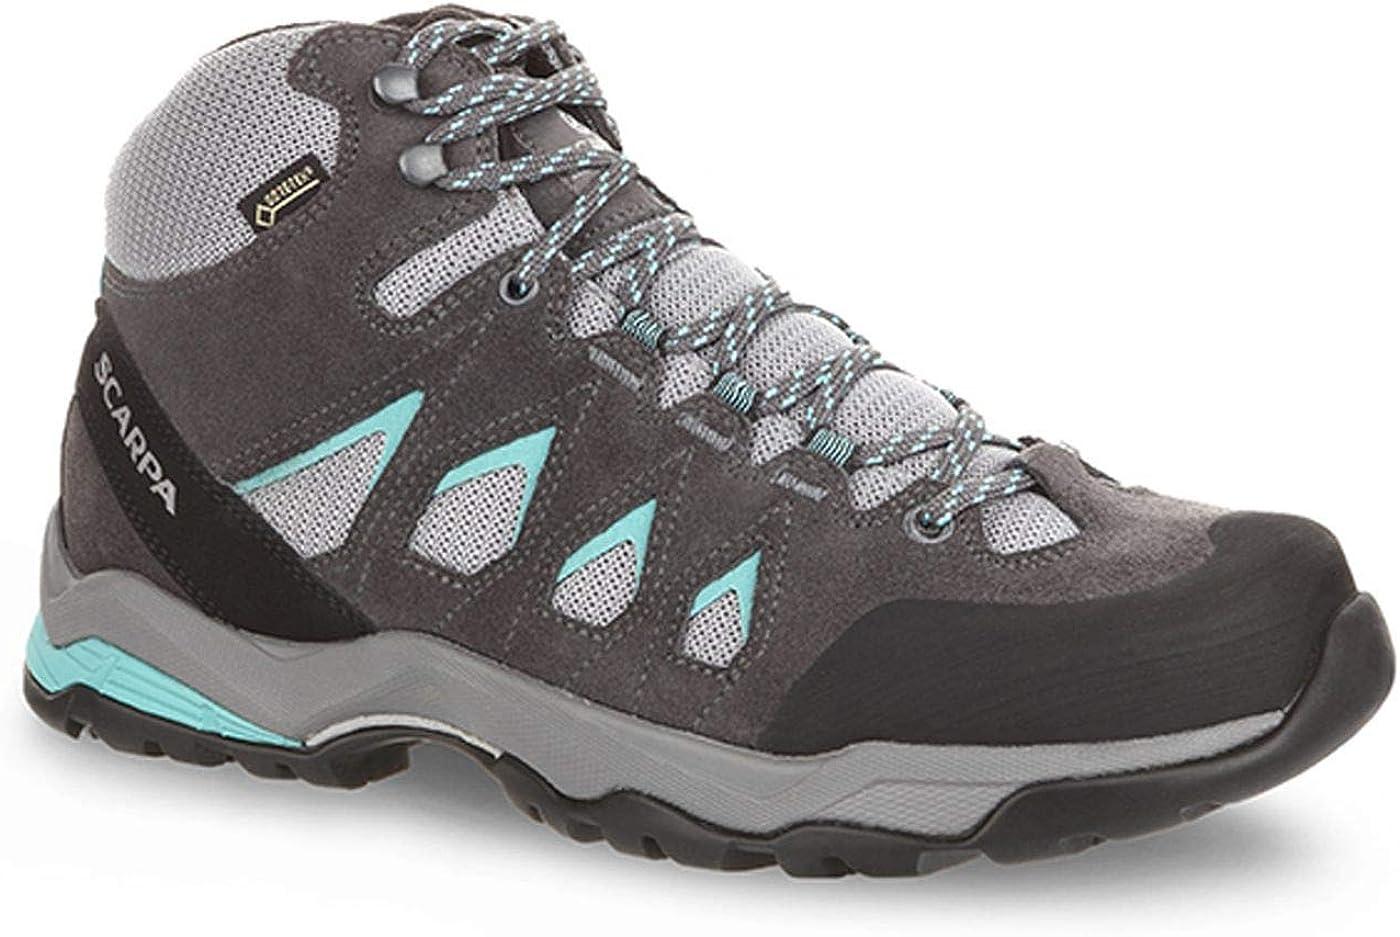 Scarpa Women s Moraine Mid GTX Hiking Shoe